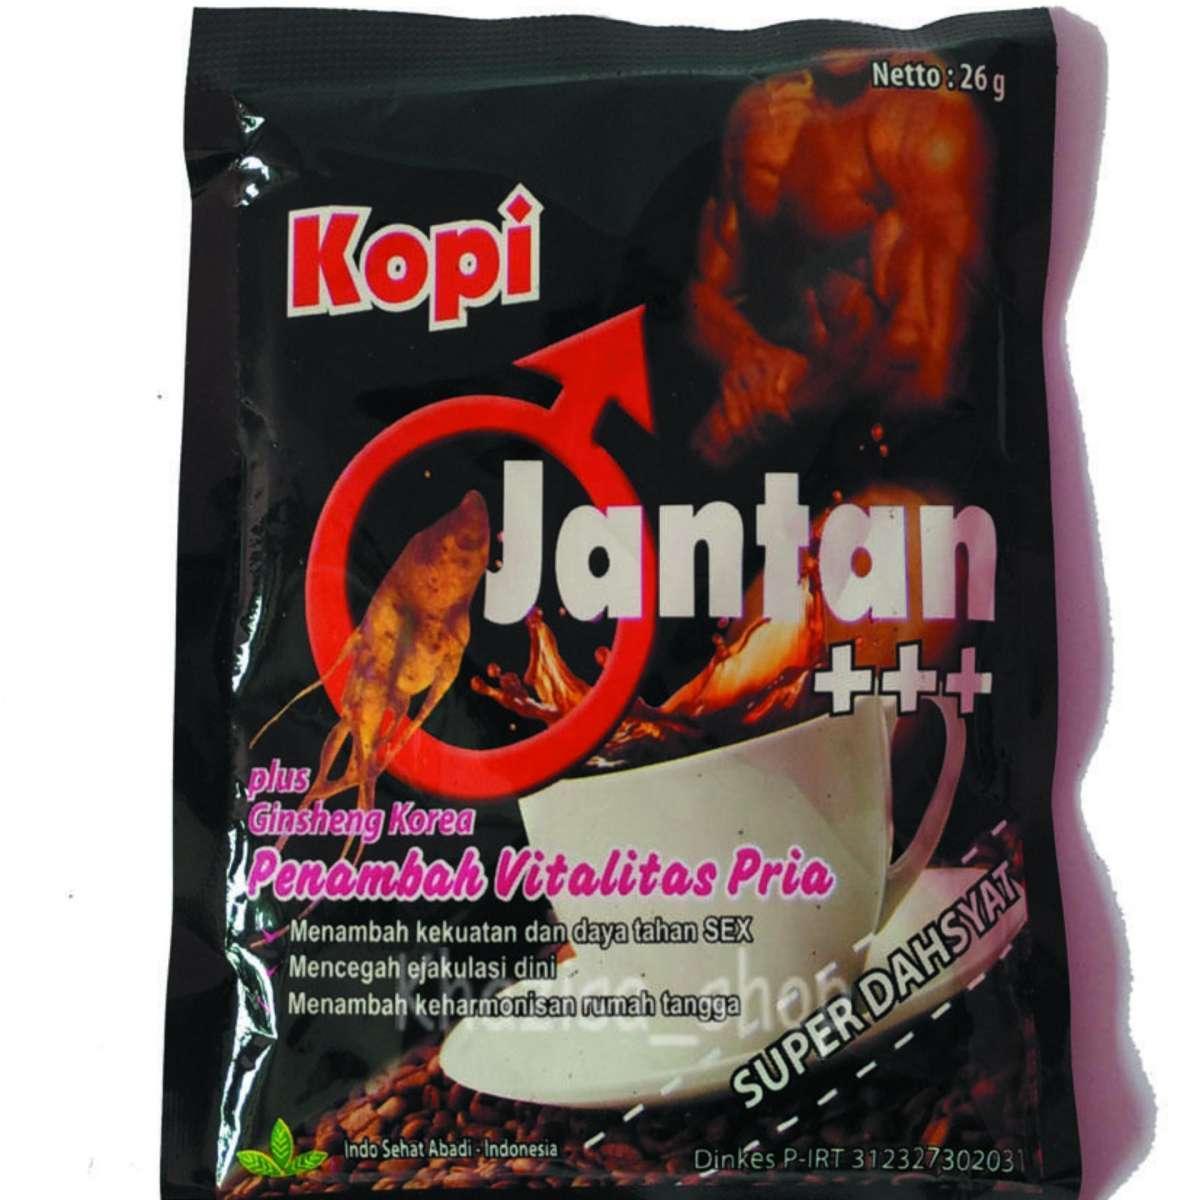 Kopi Jantan Plus Ginseng Korea - 1 Sashet By Hanifah Herbal.